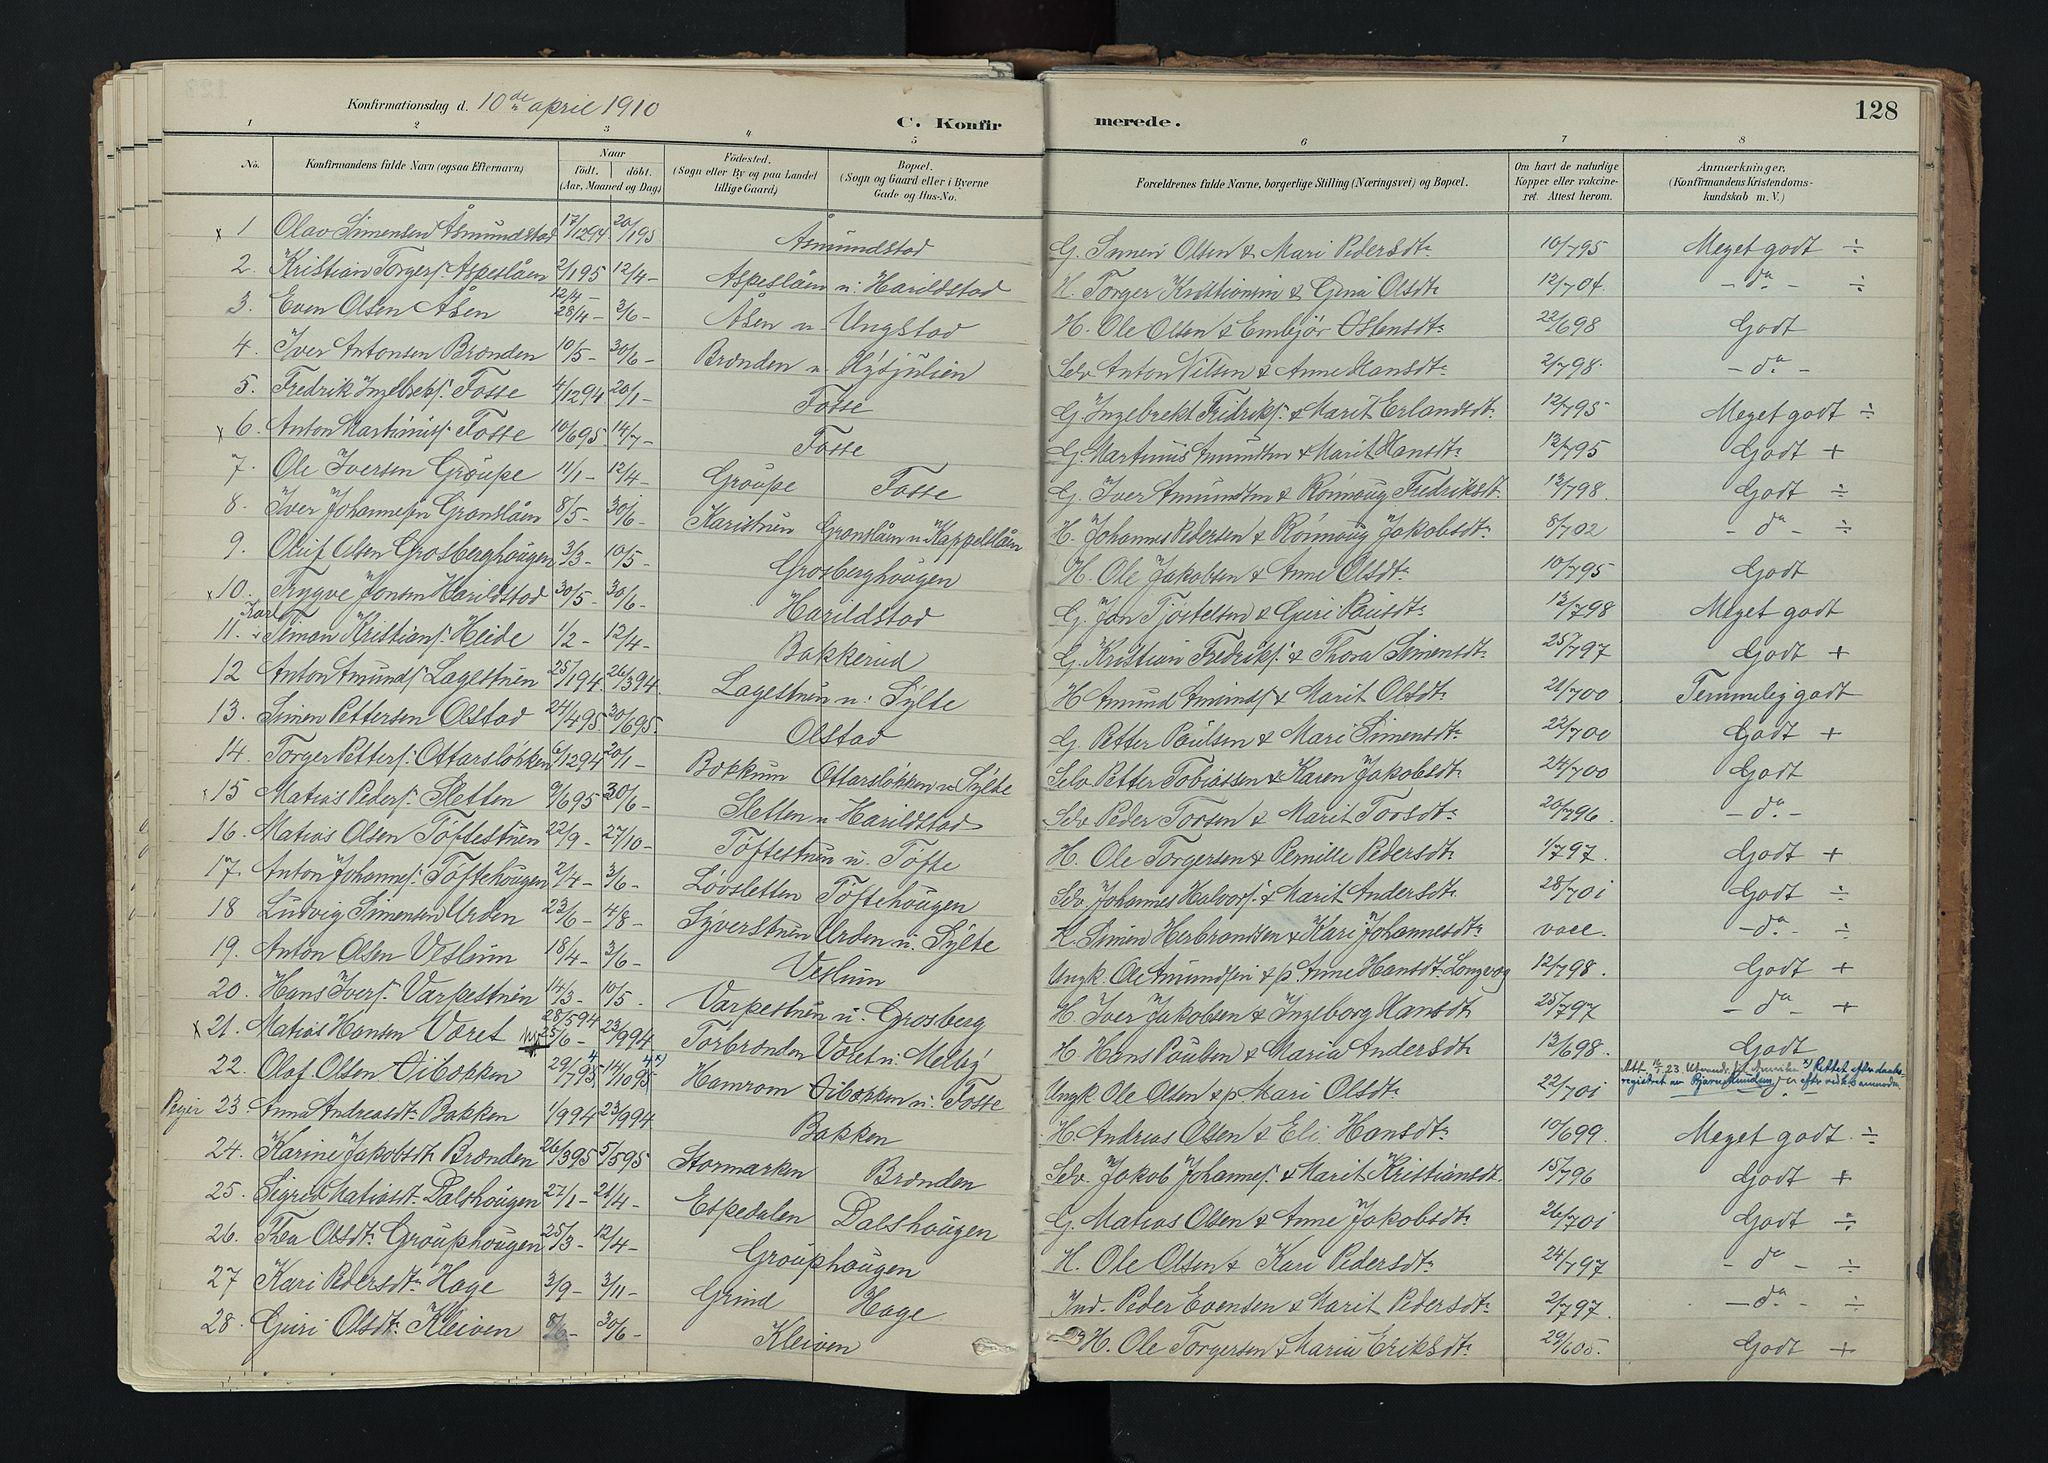 SAH, Nord-Fron prestekontor, Ministerialbok nr. 5, 1884-1914, s. 128